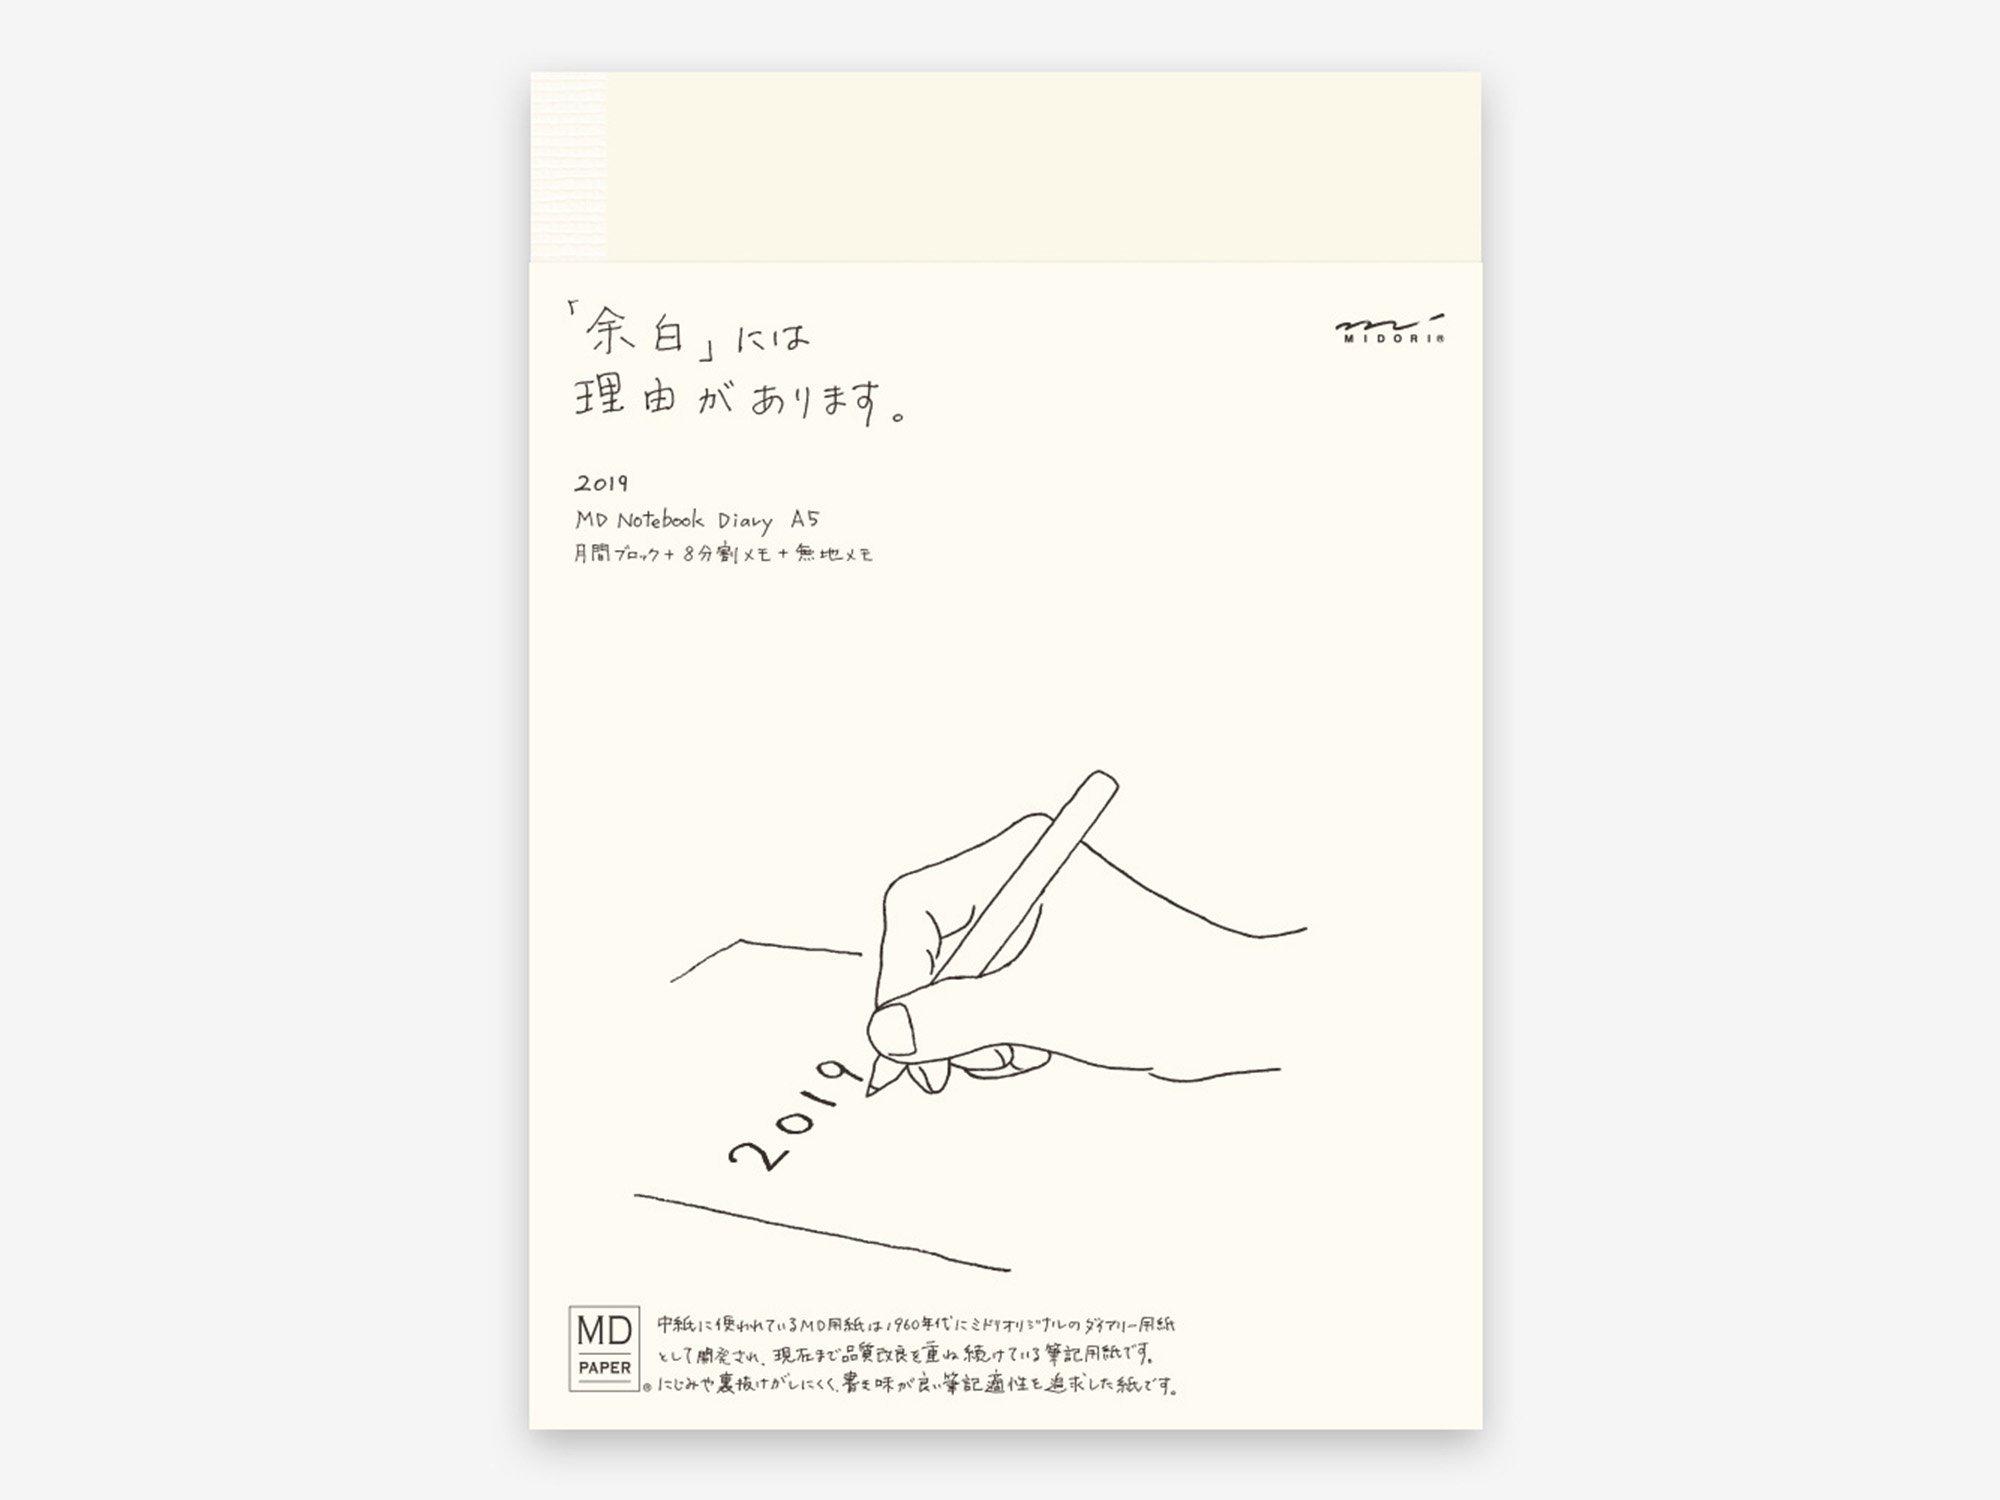 midori-md-notebook-diary-2019-a5-medium.jpg